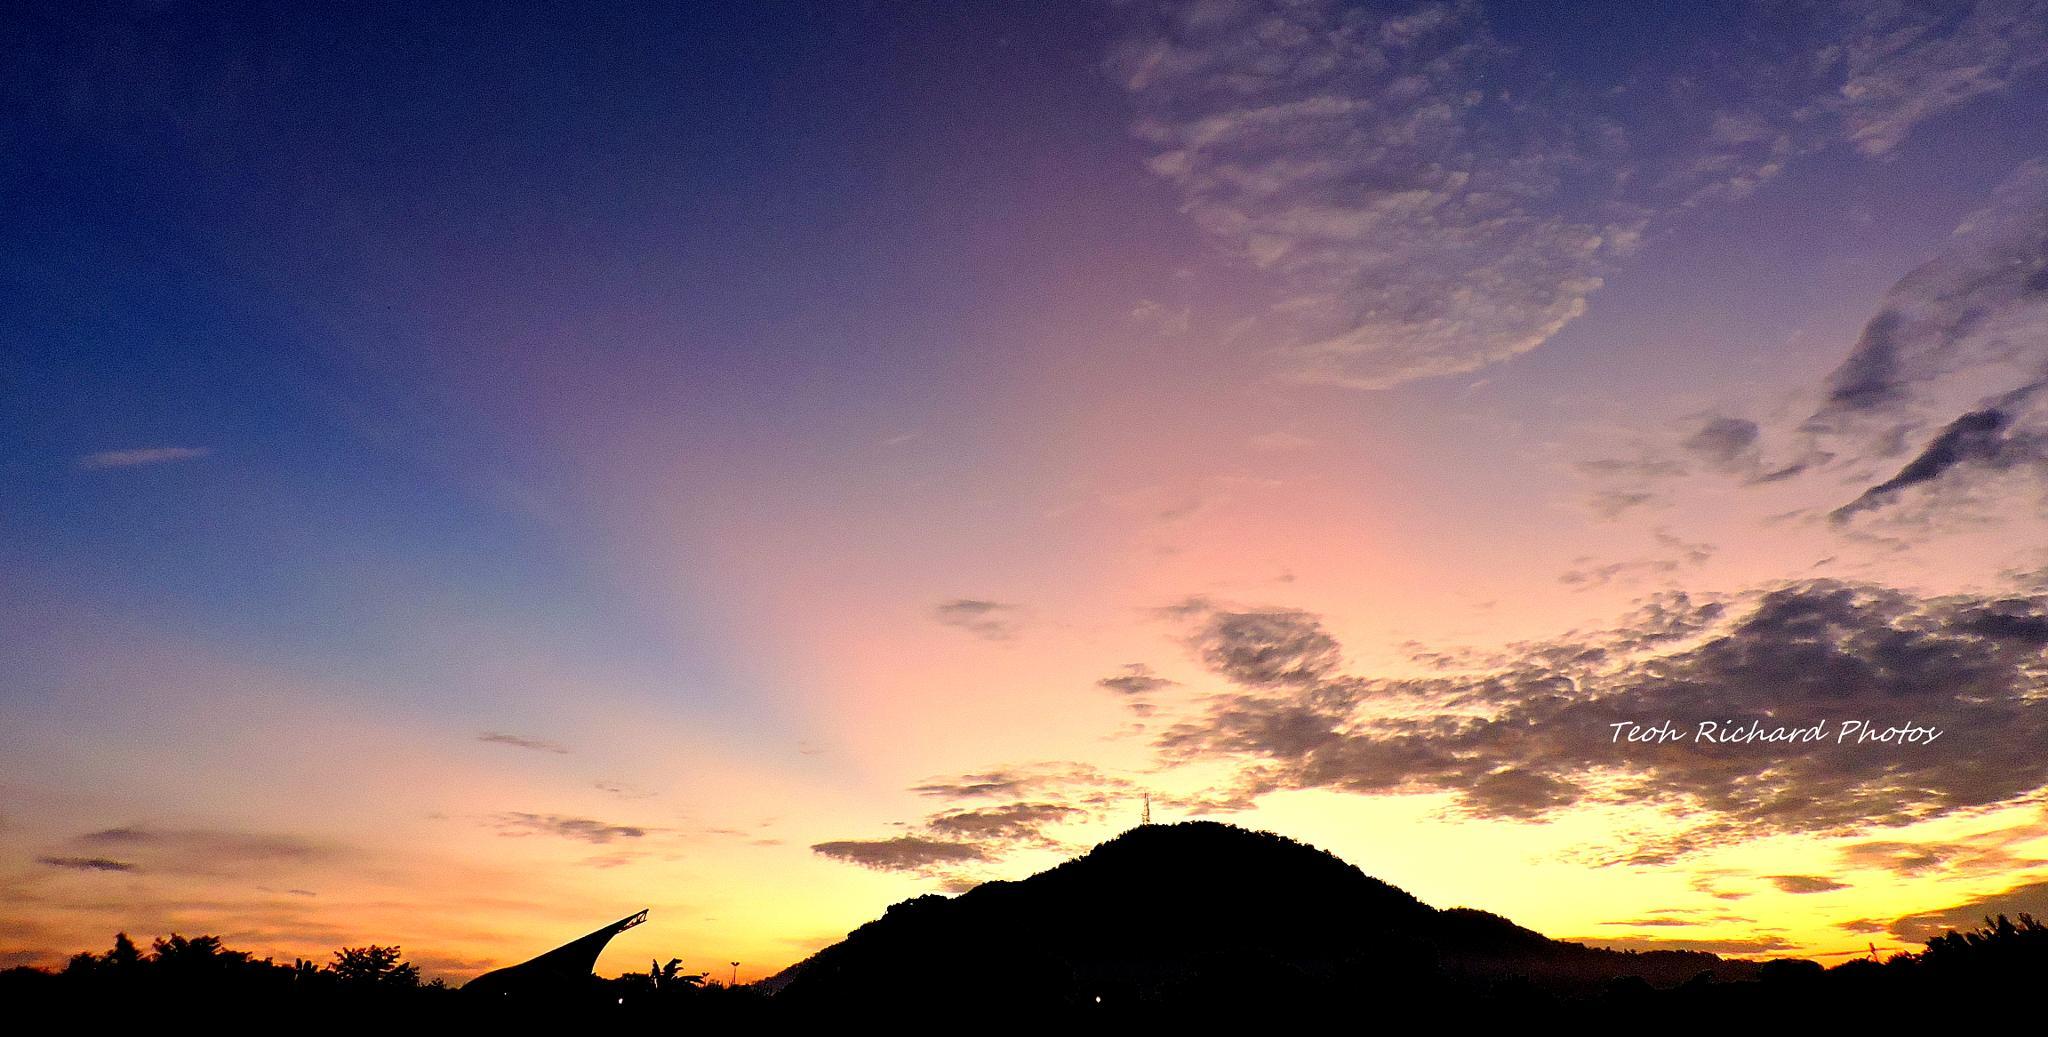 Sunrise Glow 1 by teoh.richard.15